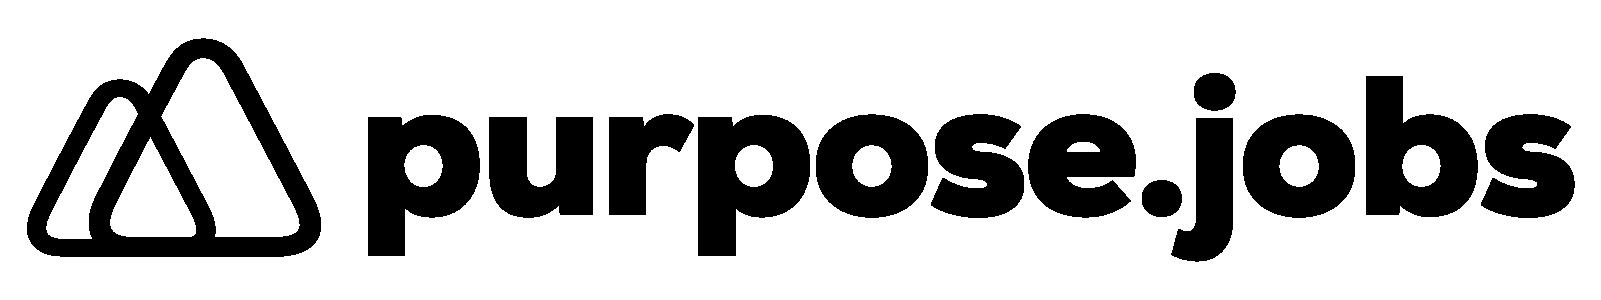 logo-purpose.jobs-black@2x